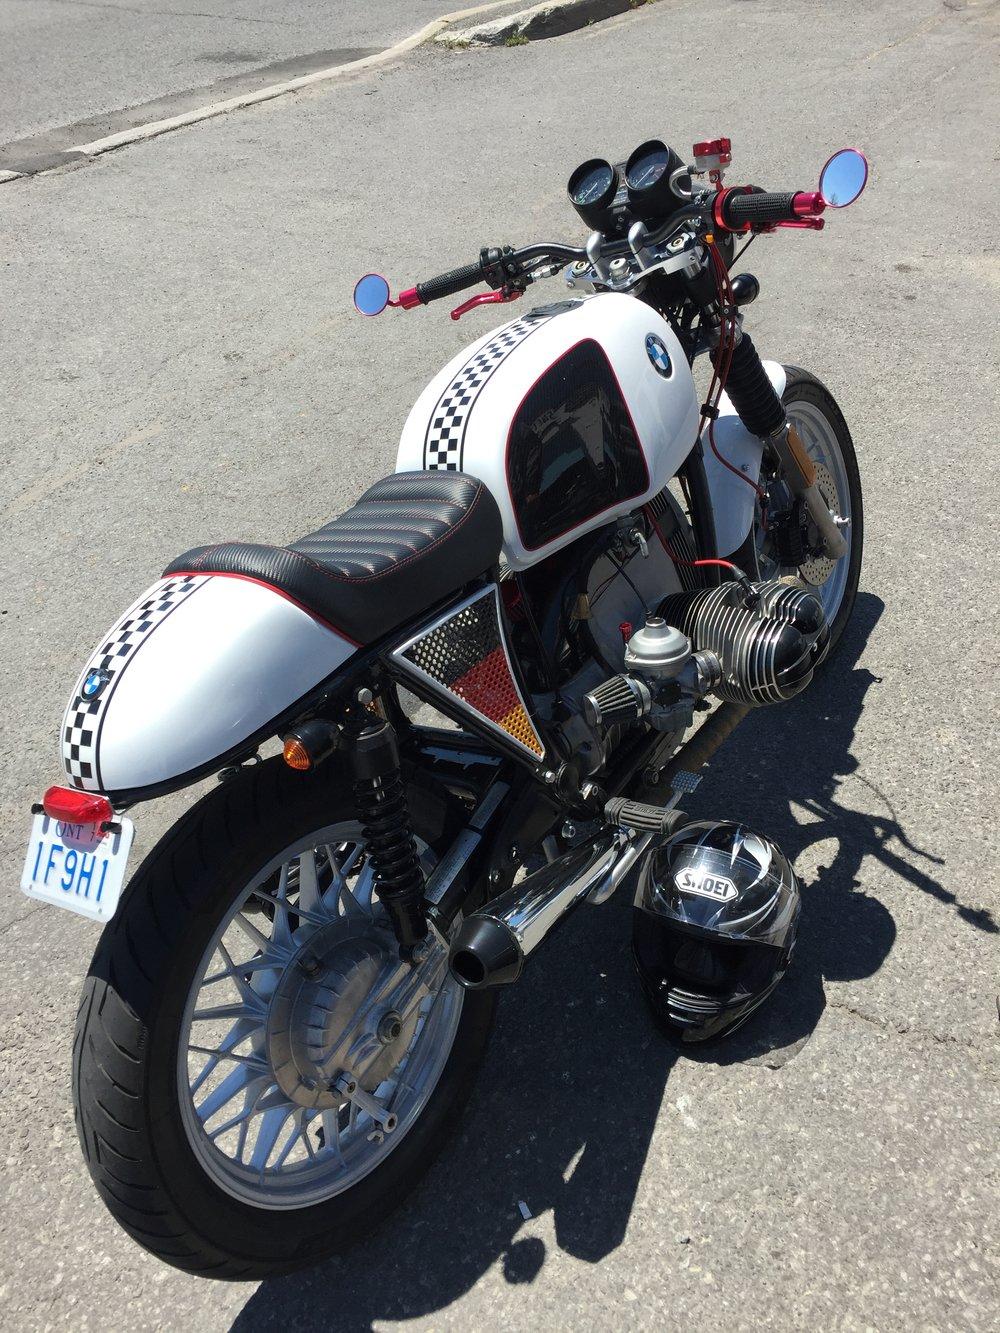 BMW Cafe Racer Custom Bike Made by Sketchs Ink Ottawa Canada